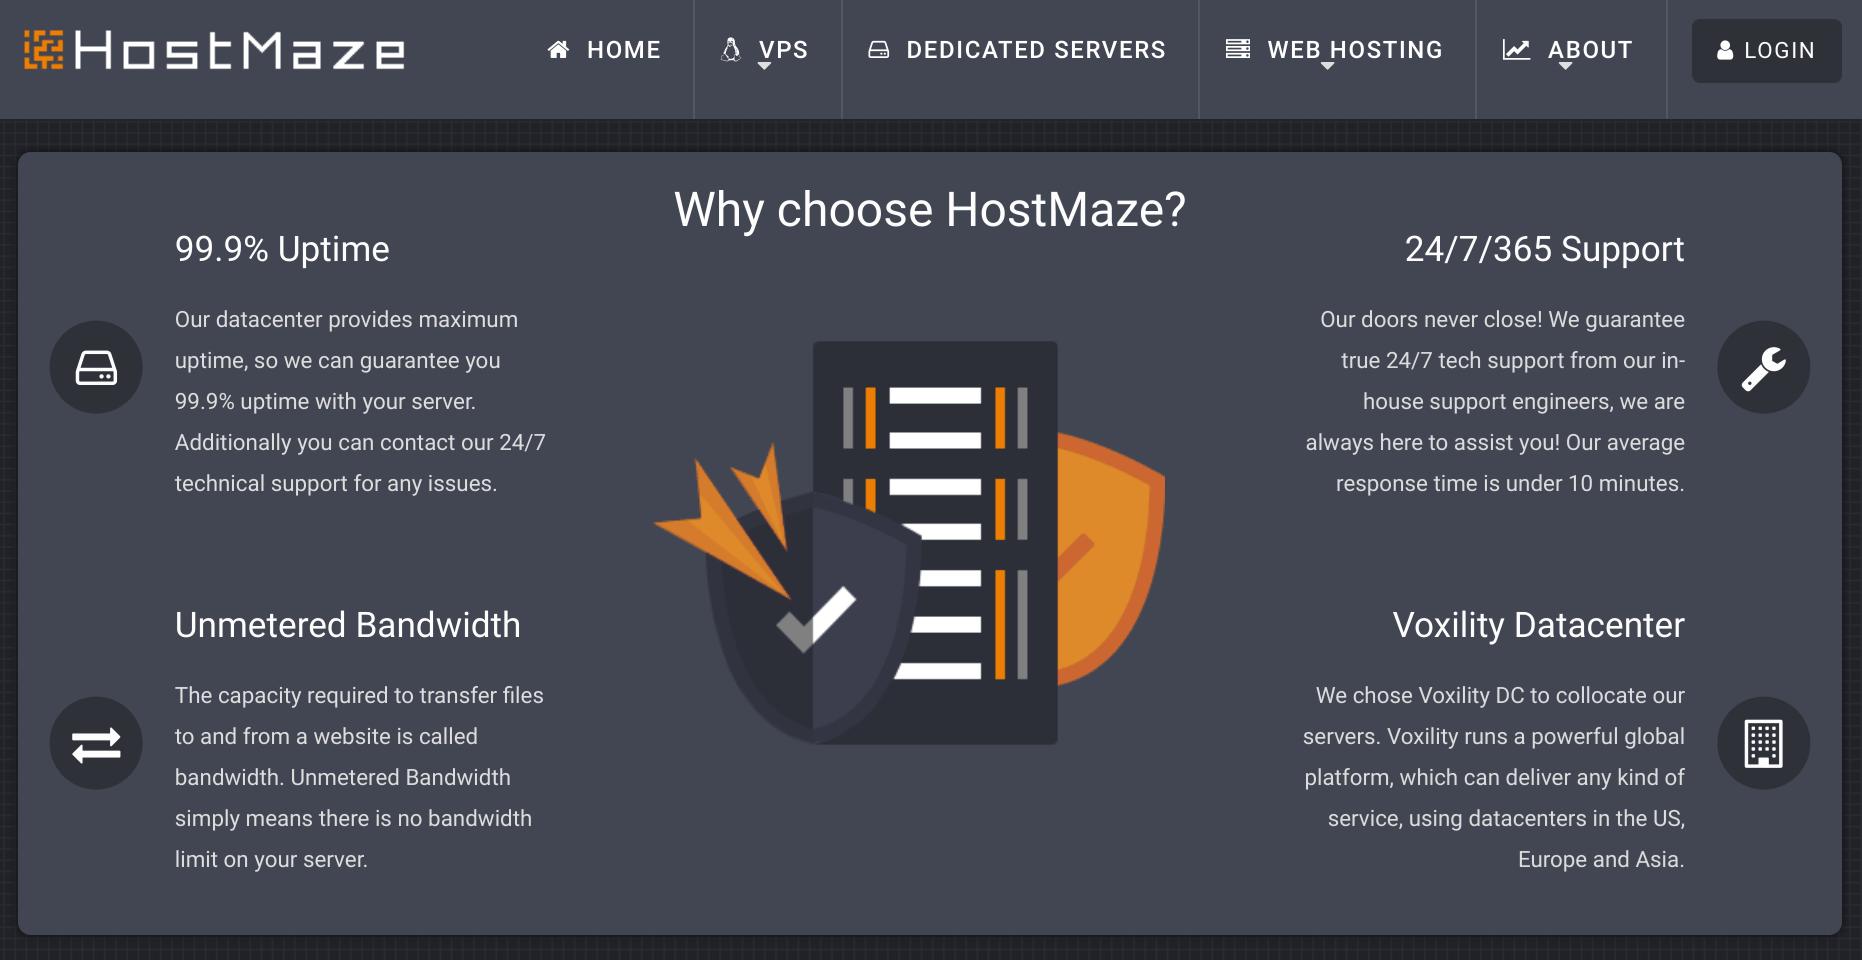 HostMaze